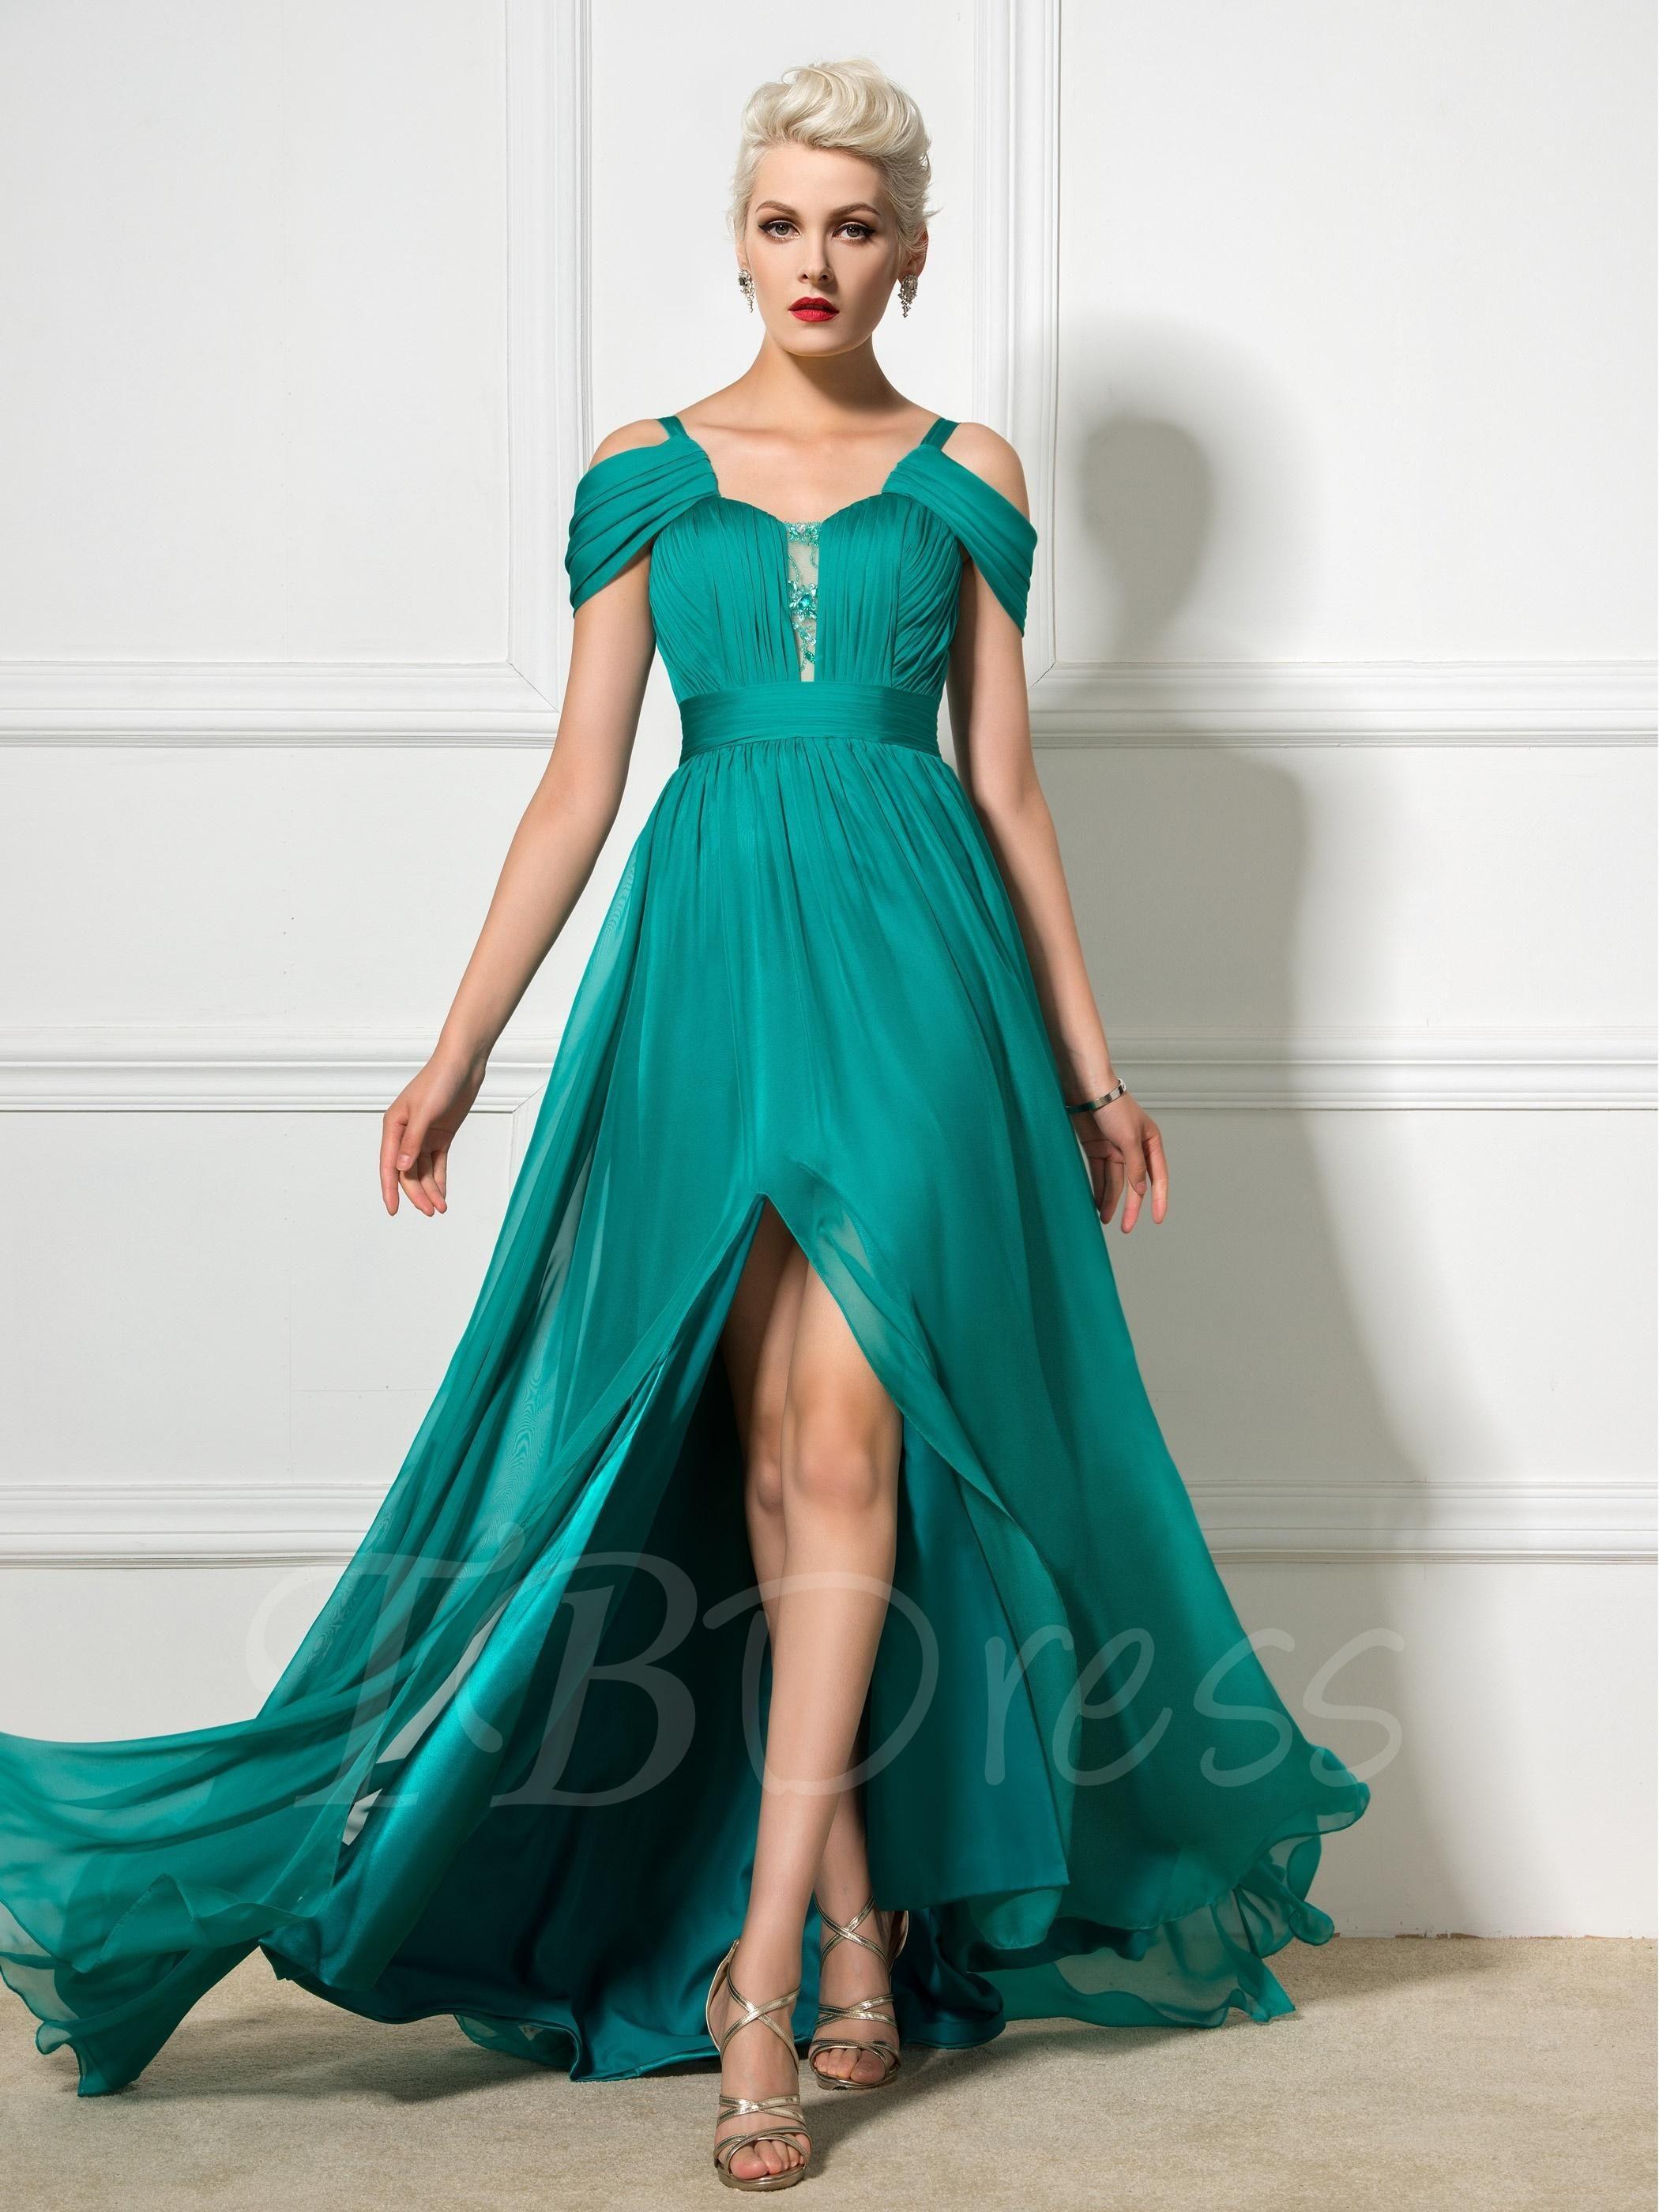 Amazing Prom Dresses Nordstroms Composition - All Wedding Dresses ...